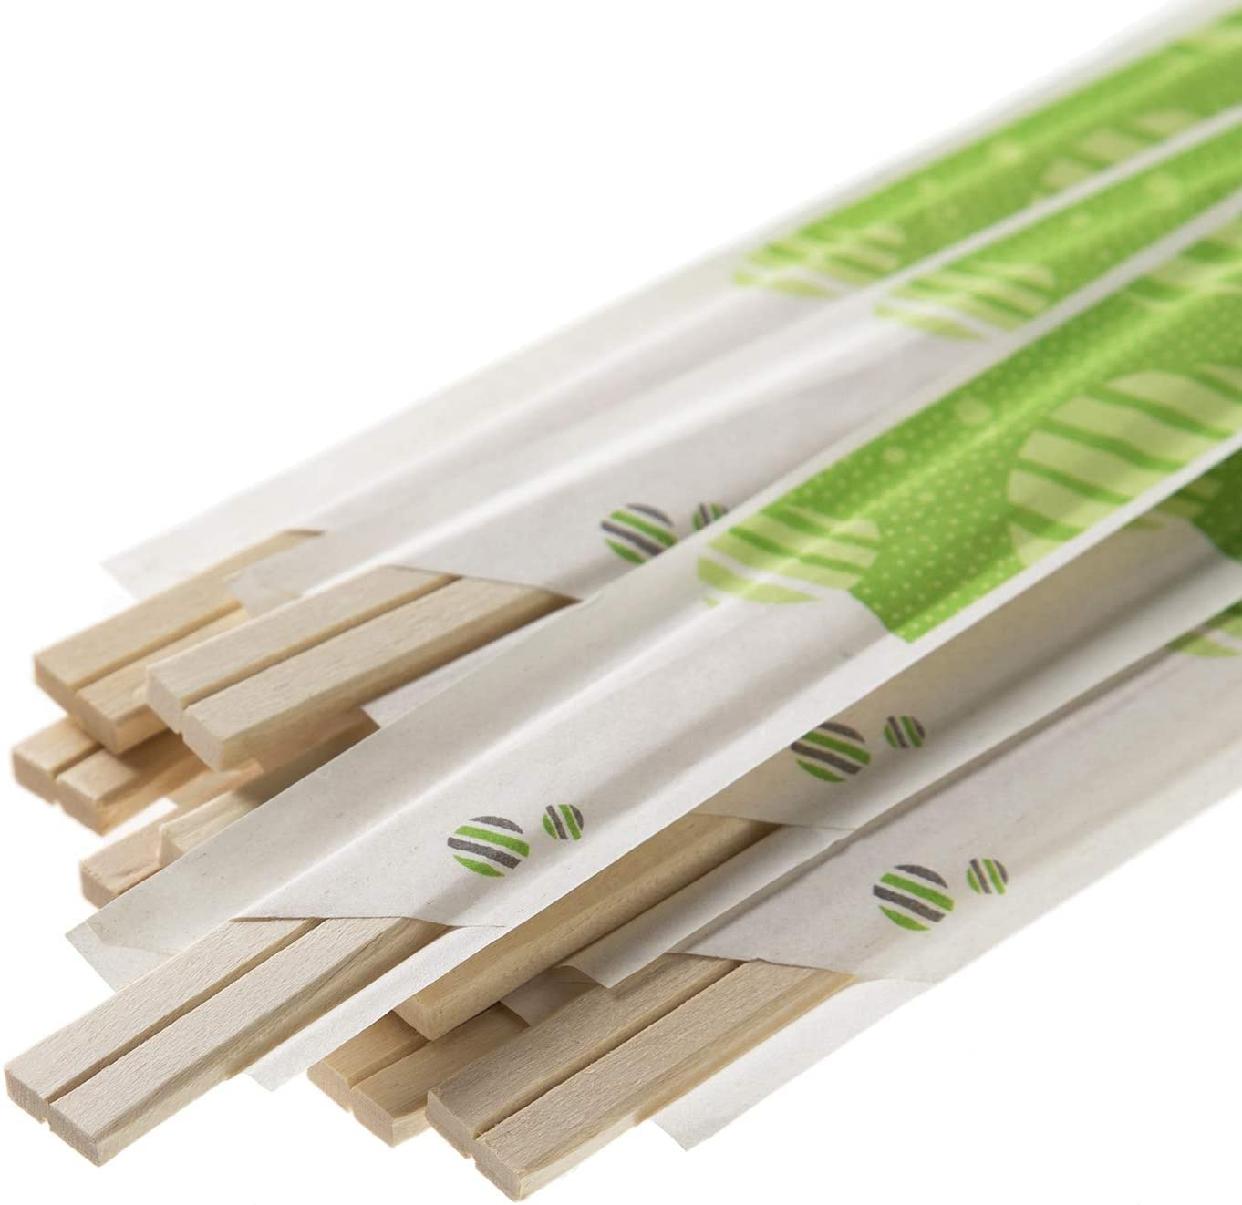 HouseLab(ハウスラボ)元禄割箸 袋入り 100膳 AR-002 20.5cmの商品画像3